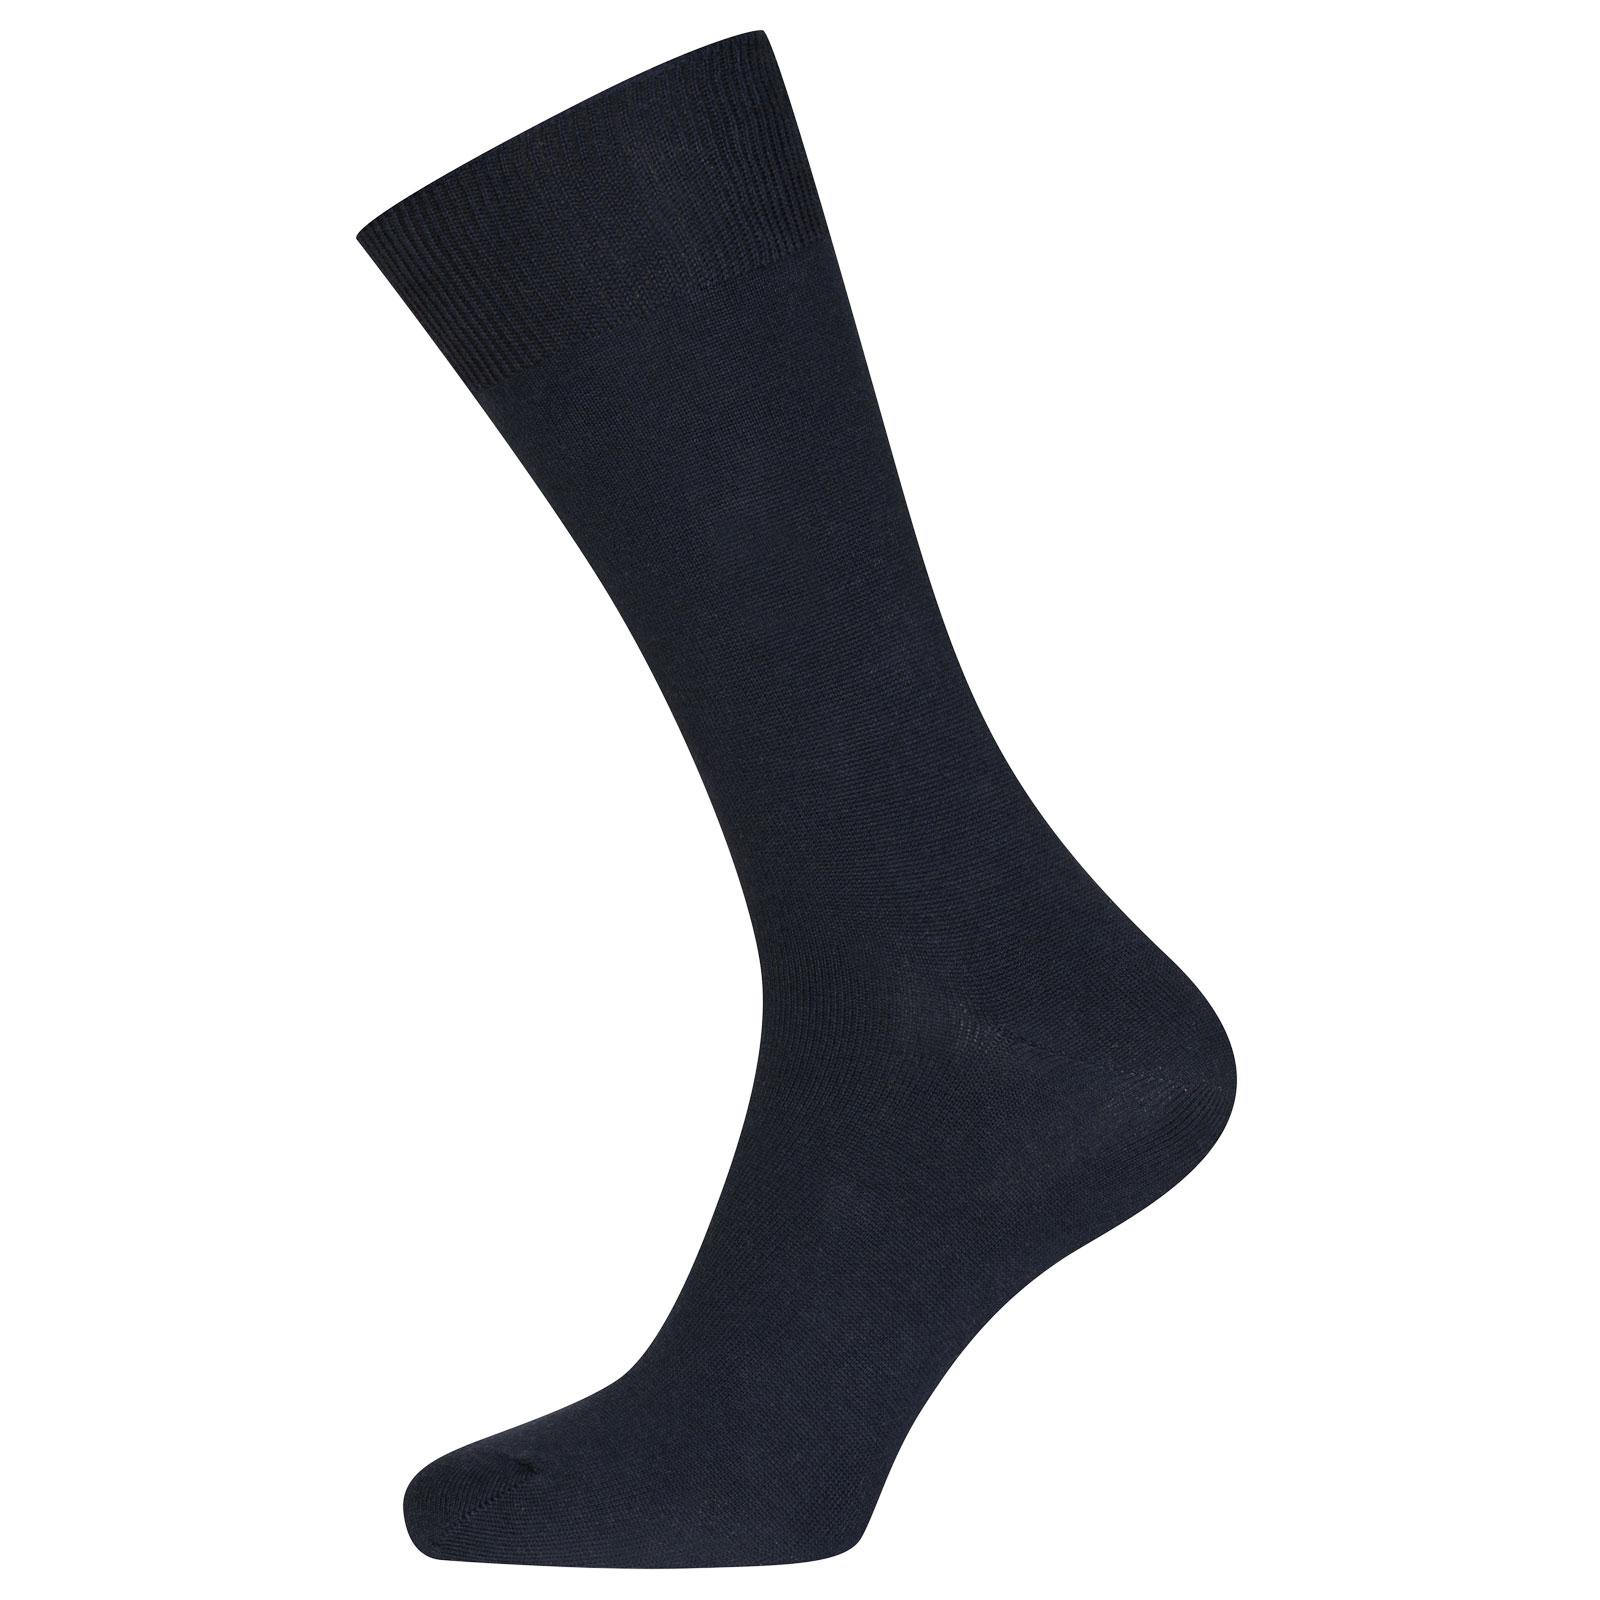 John Smedley Beta Merino Wool Socks in Midnight-M/L